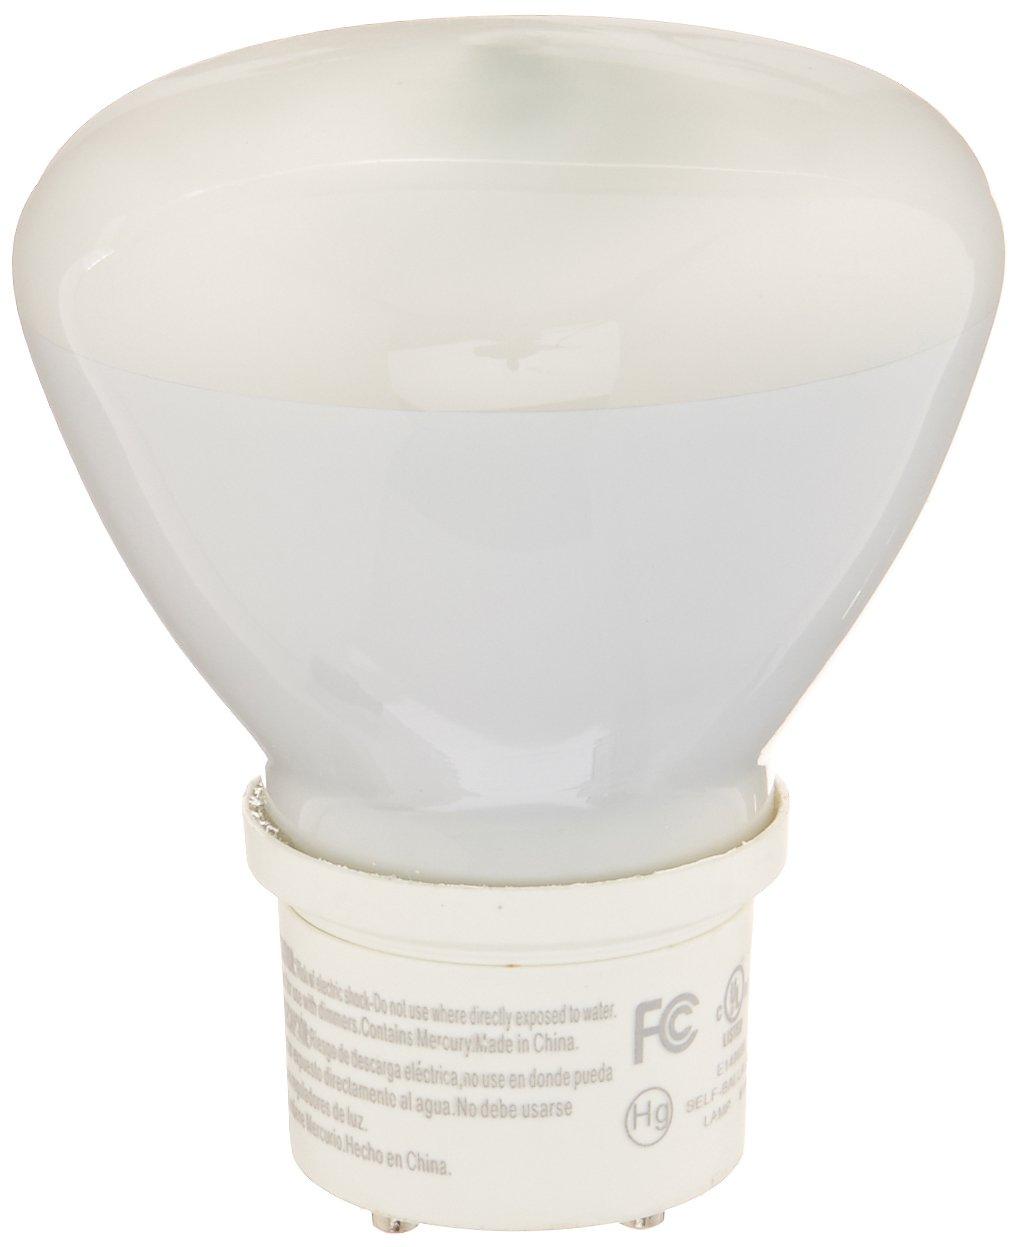 TCP CFL R30, 75W Equivalent, Bright White (3000K) GU24 Base Flood Light Bulb by TCP (Image #1)